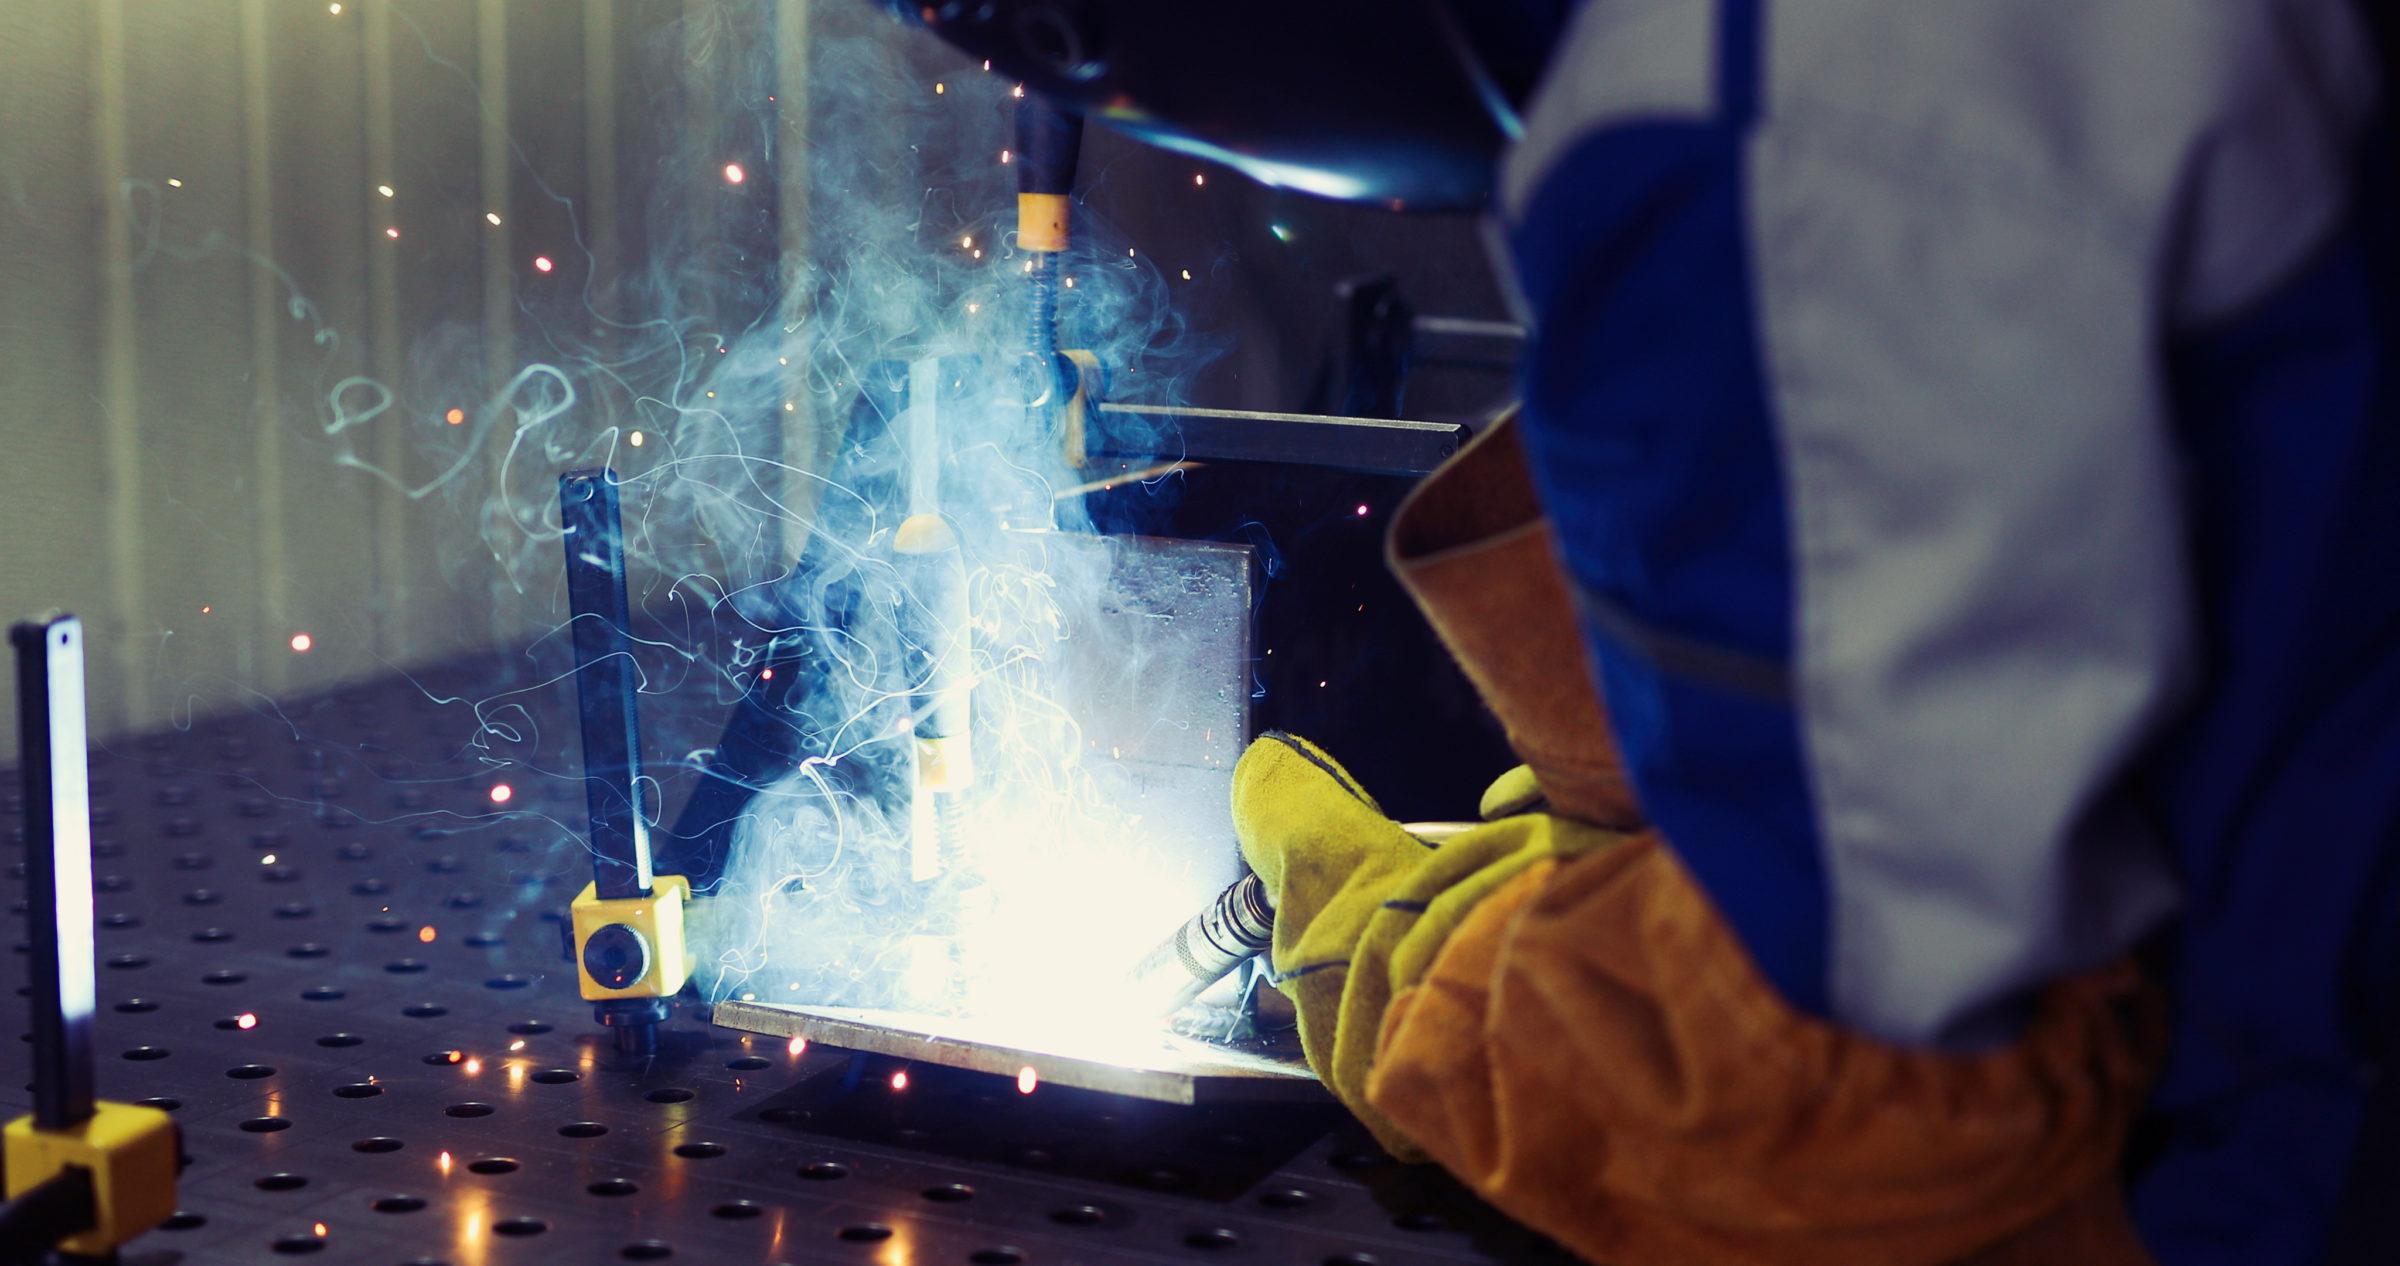 metal worker welding in metal industry factory FG8ZMSC